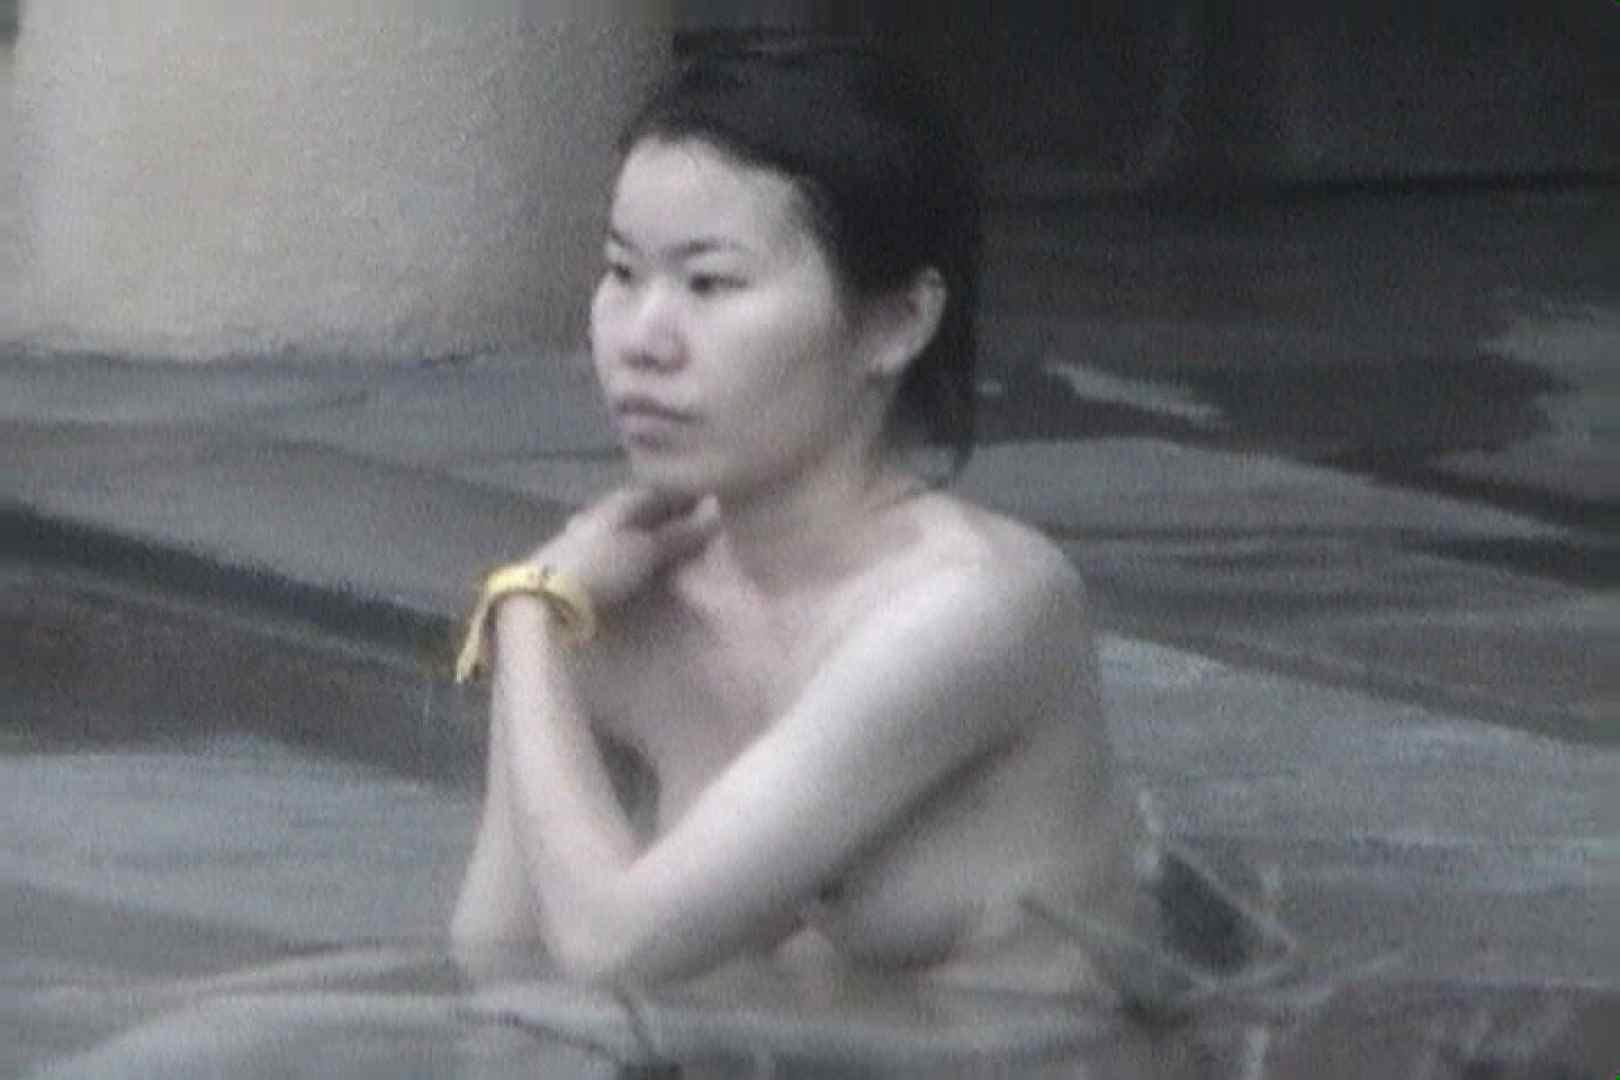 Aquaな露天風呂Vol.556 露天風呂編  99PIX 54